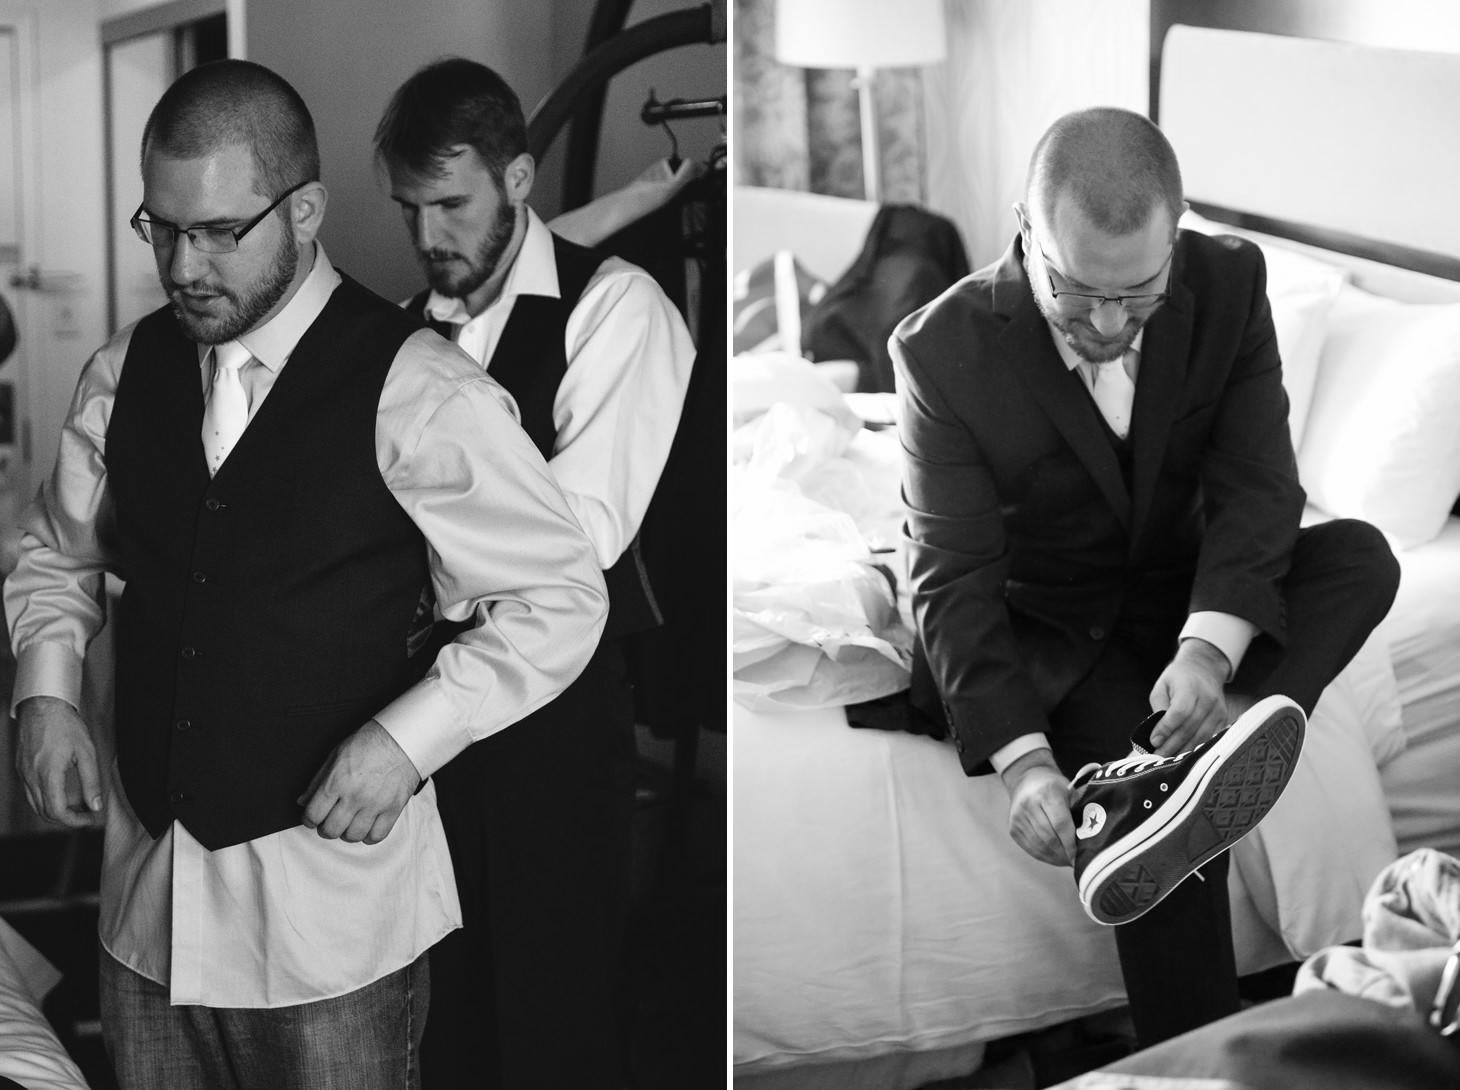 008-nyc-wedding-photographer-nj-nerdy-dr-who-firehouse-wedding-smitten-chickens.jpg